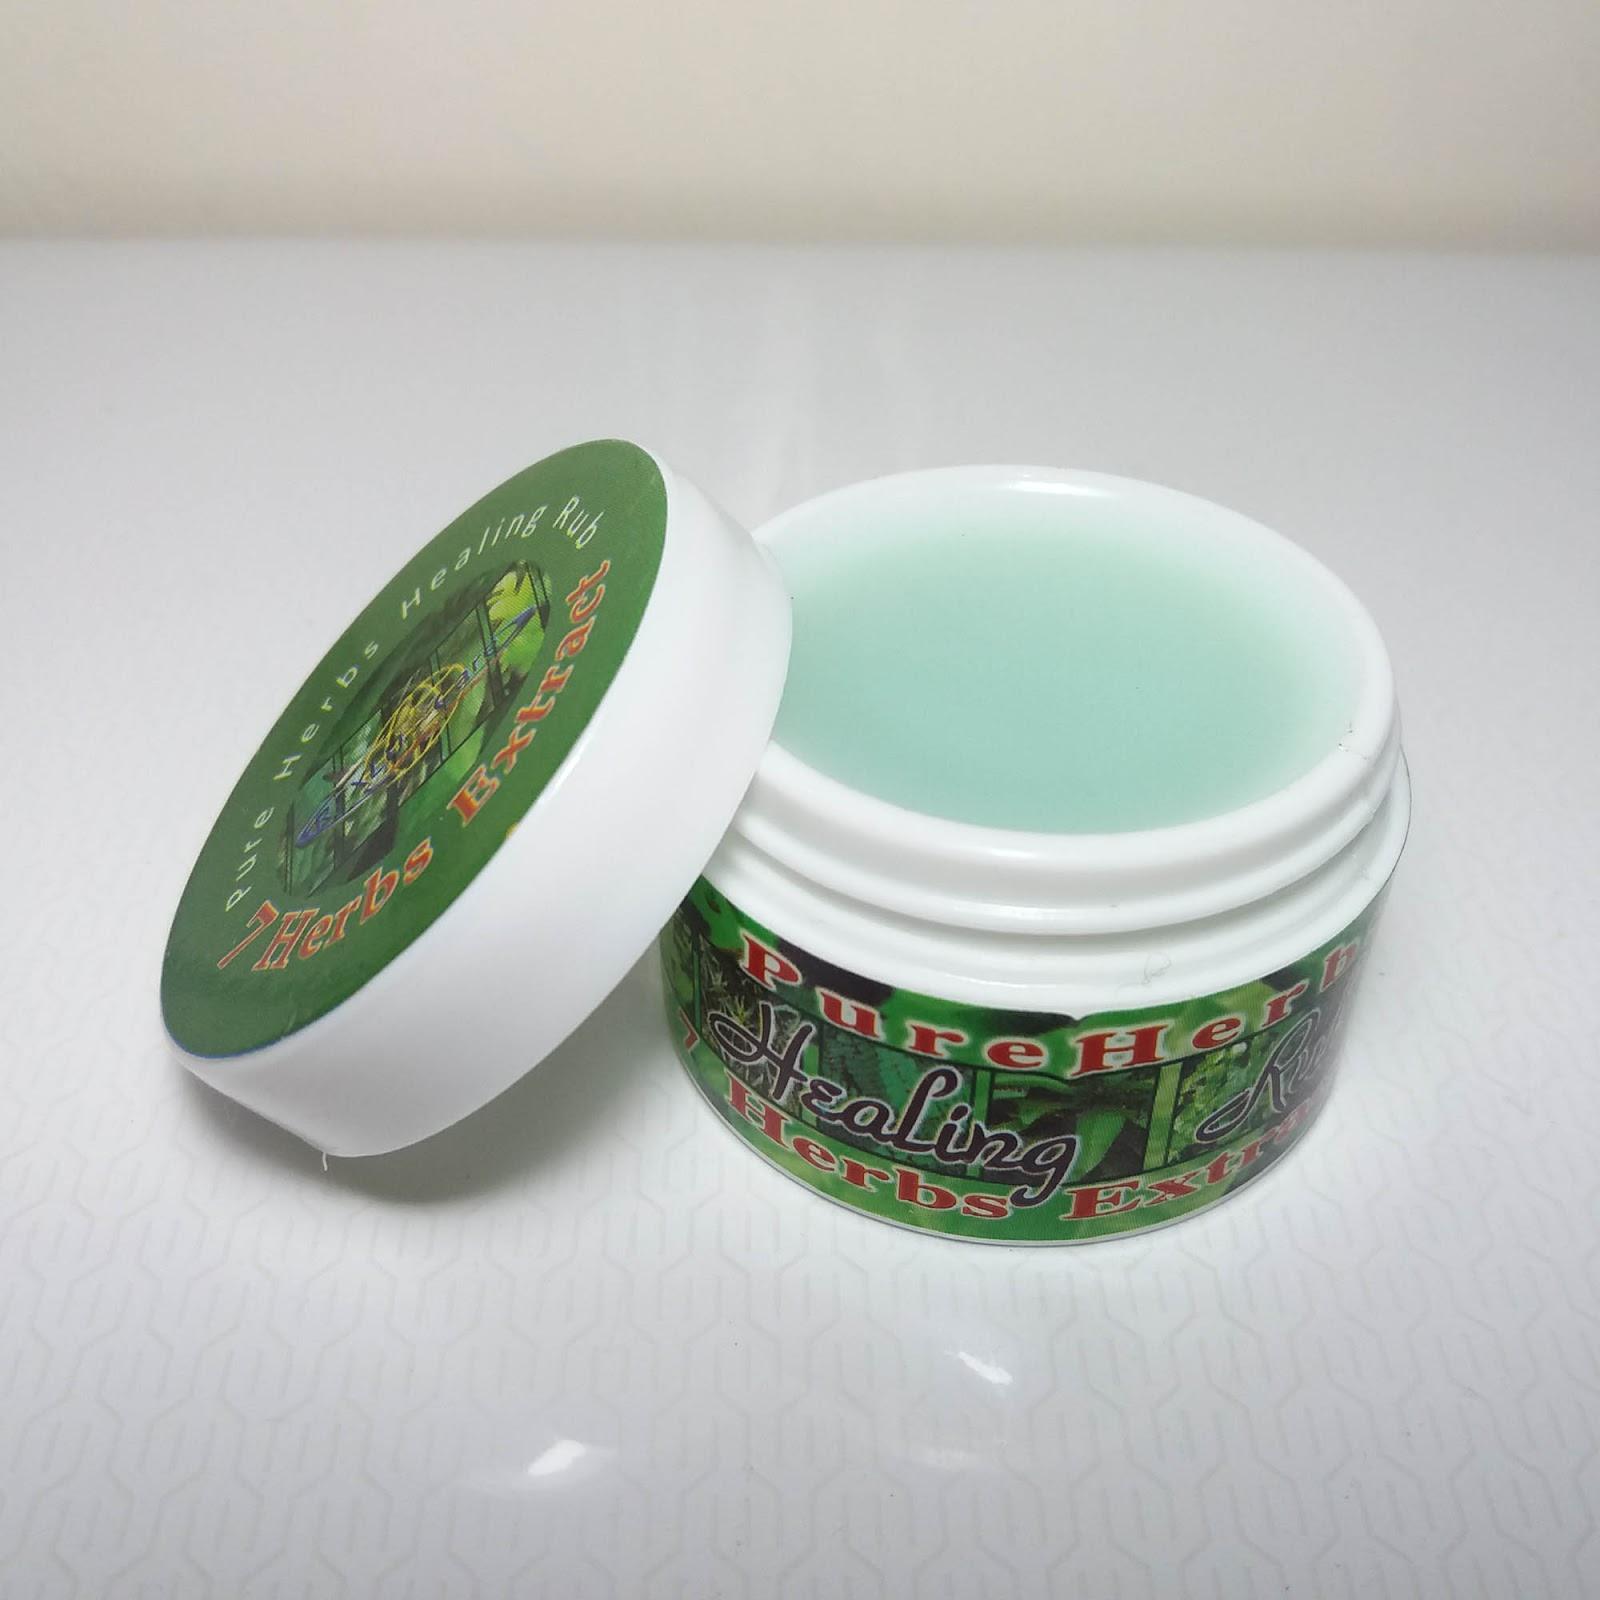 Smart Buy - Online Store: 7 Herbs Extract Pure Herbs Healing Rub